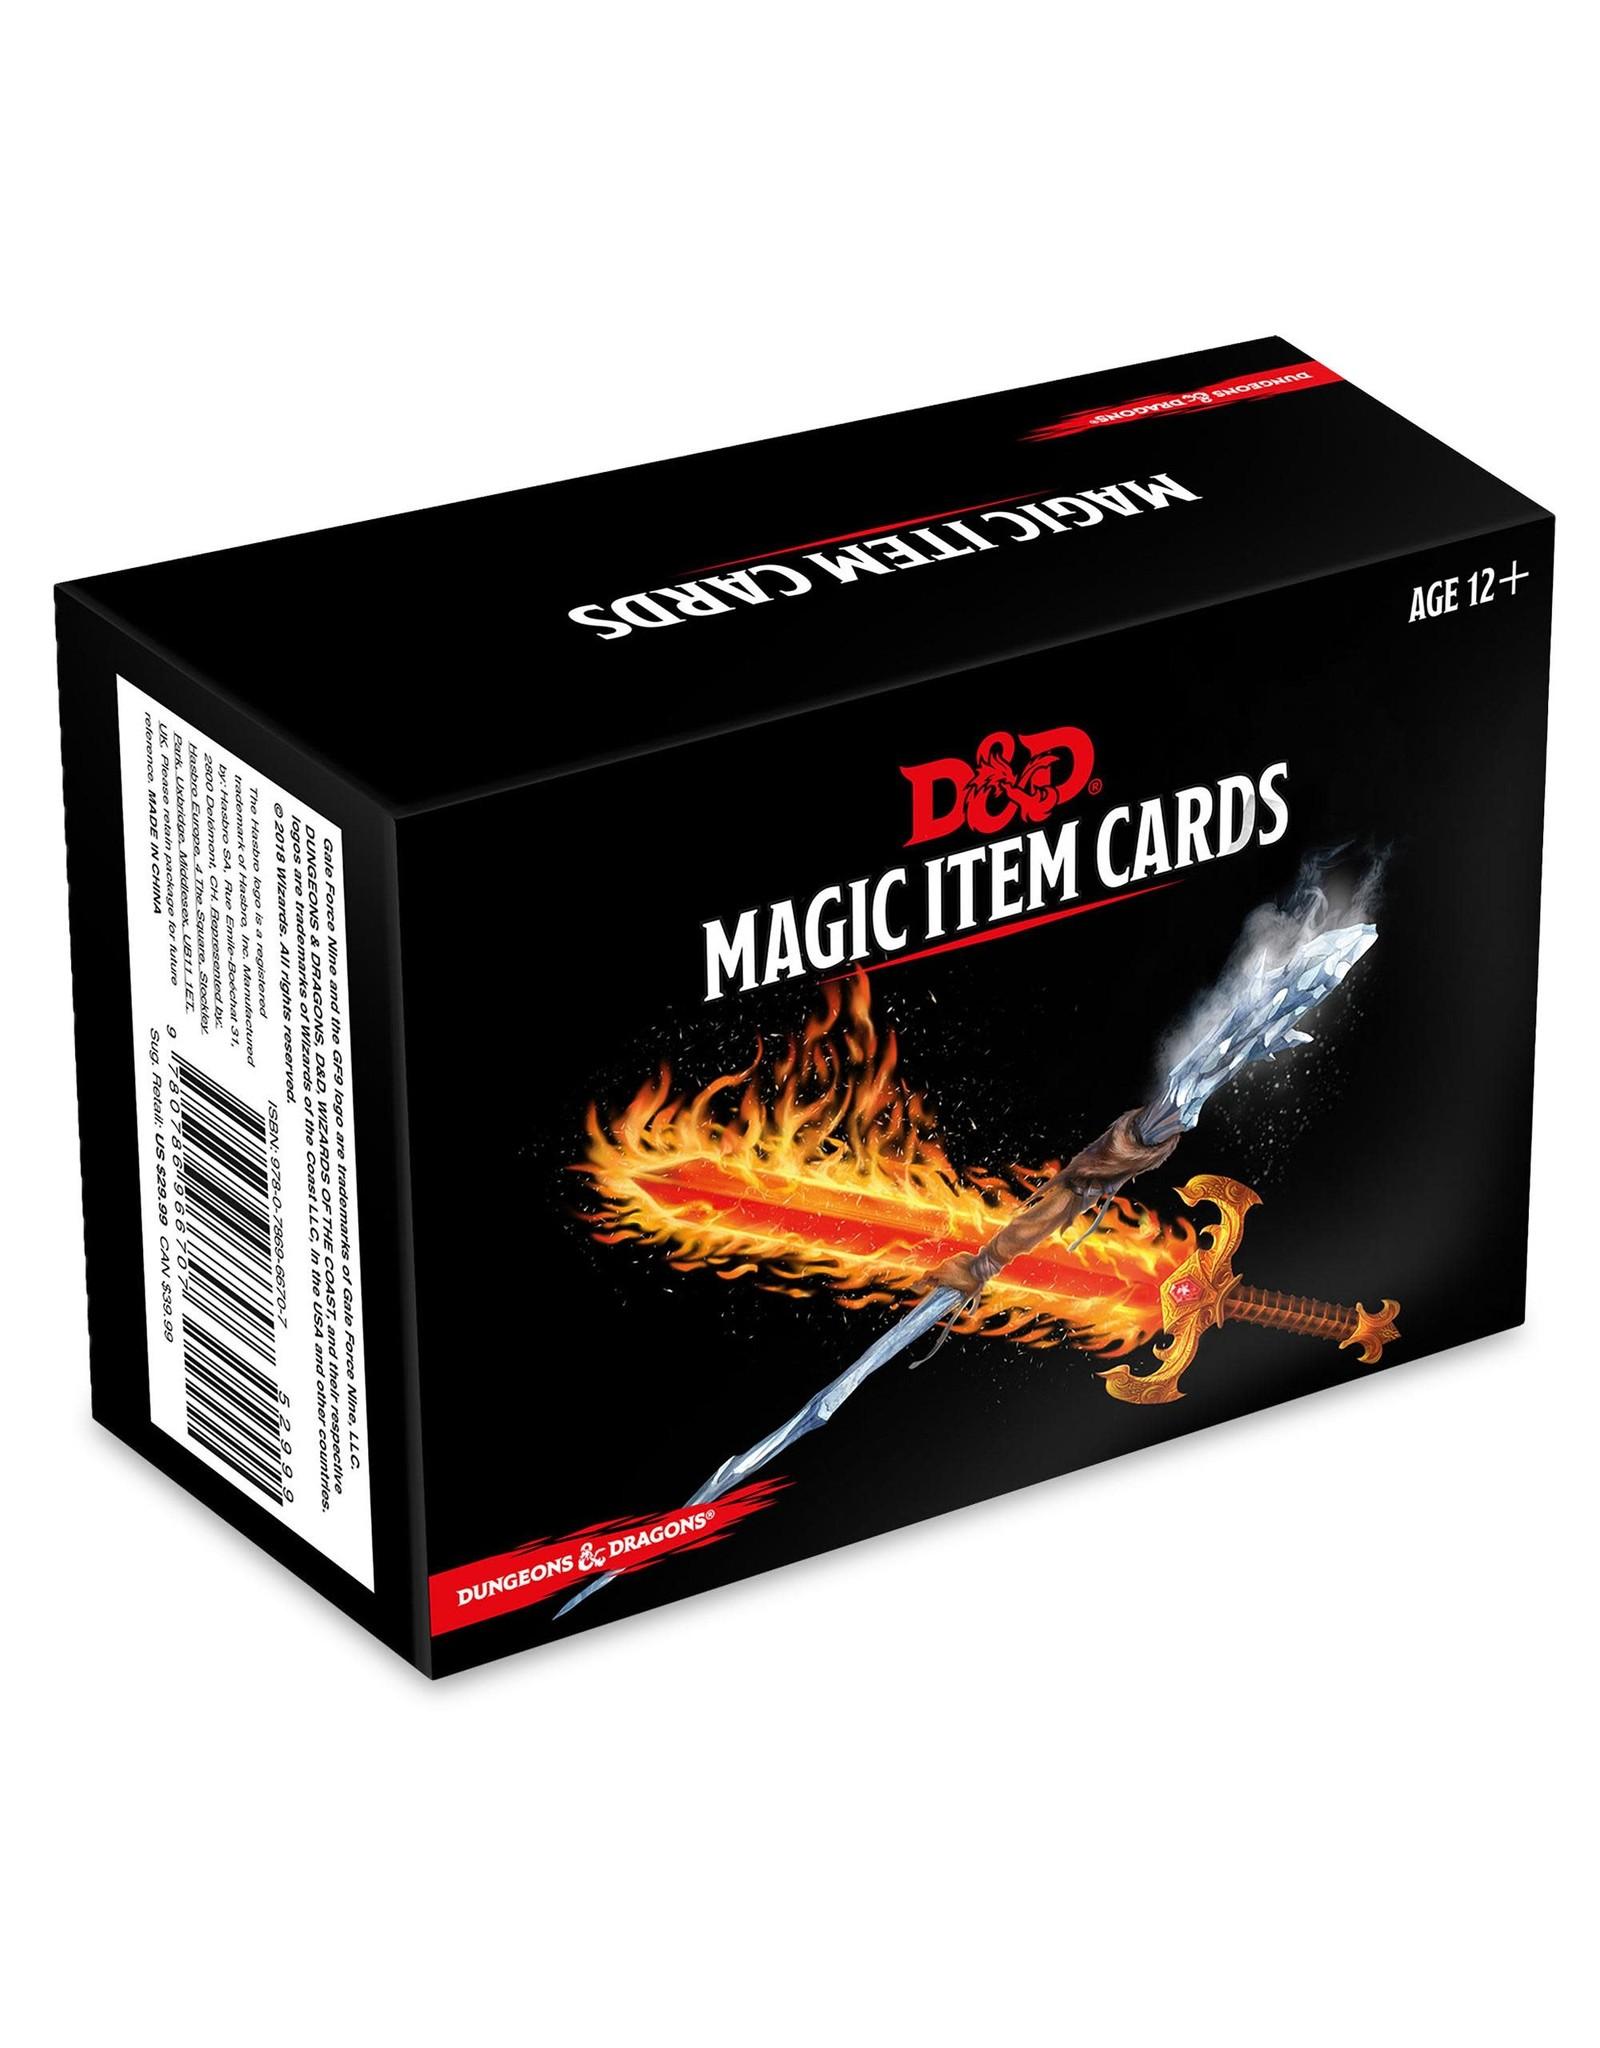 GaleForce9 D&D: Magic Item Cards